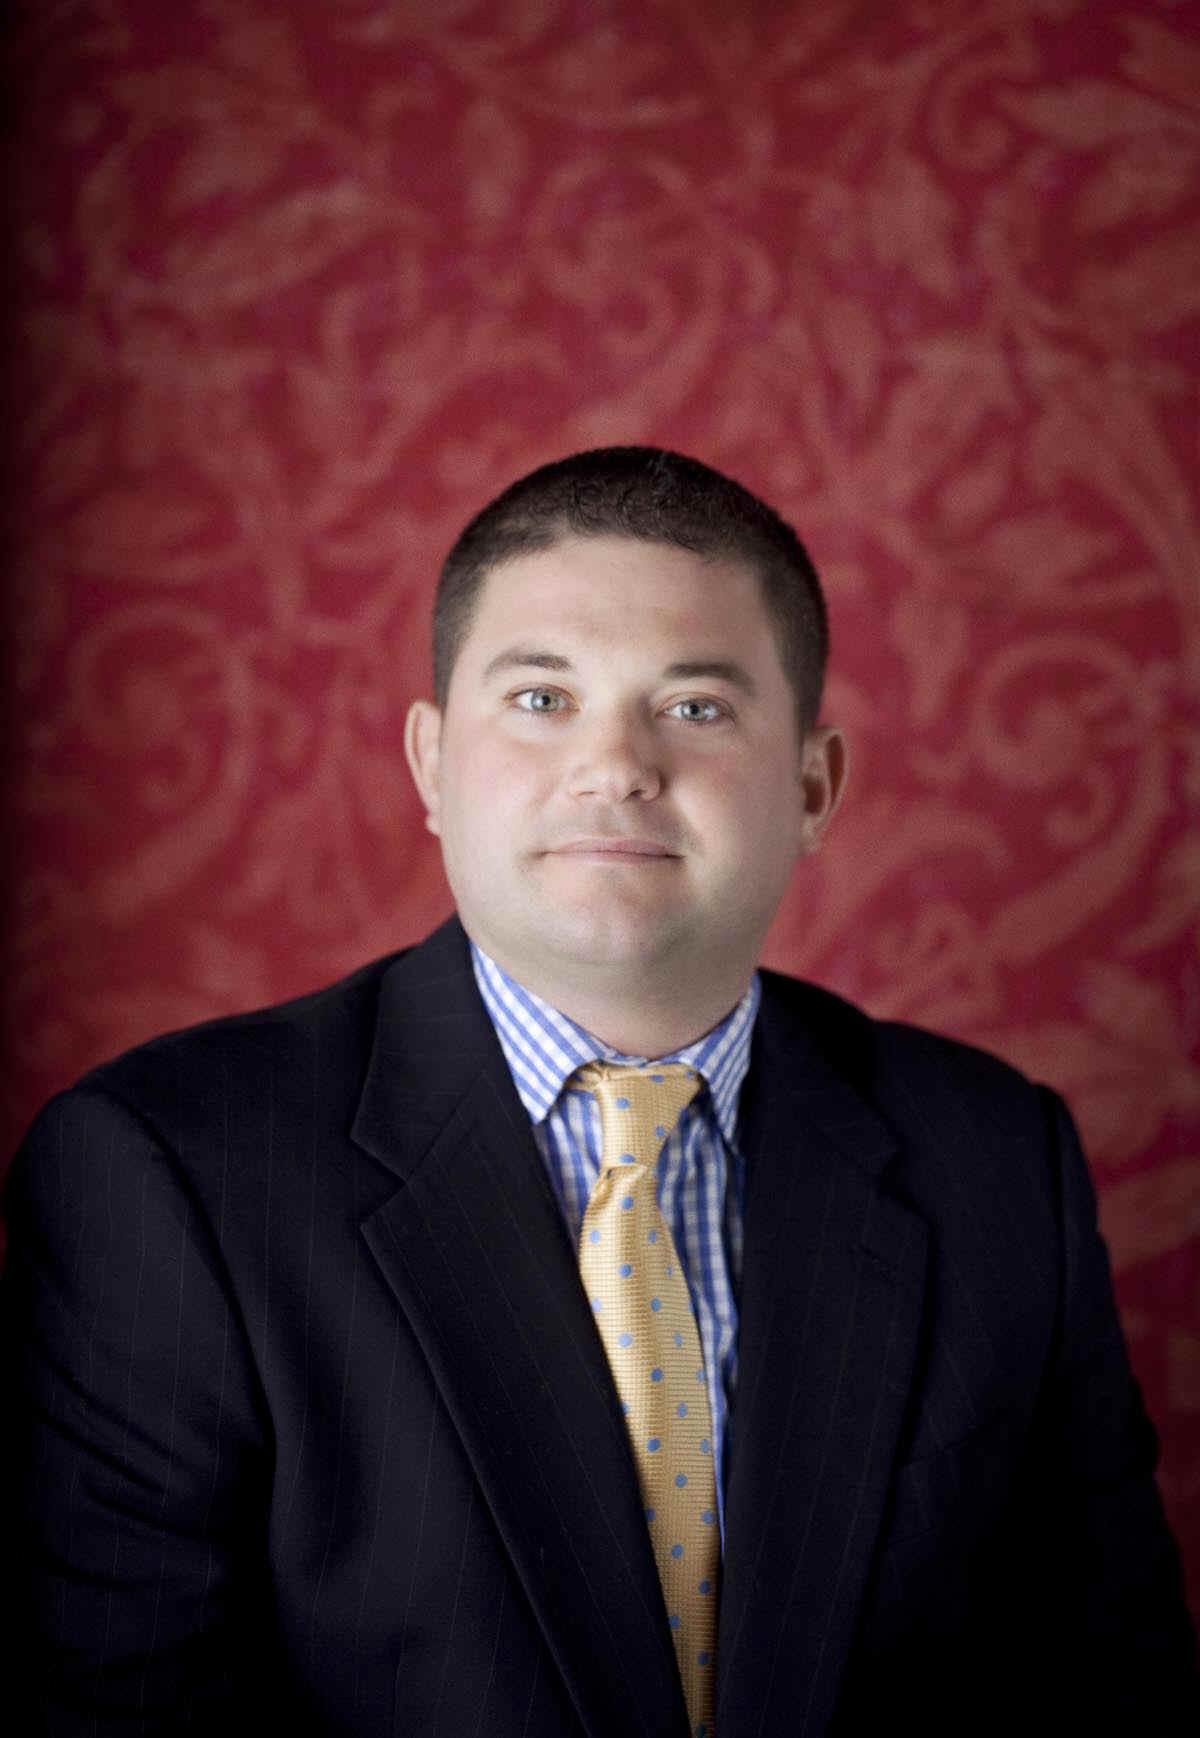 Alleghany Co VA Board of Supervisors Member - Matt Garten